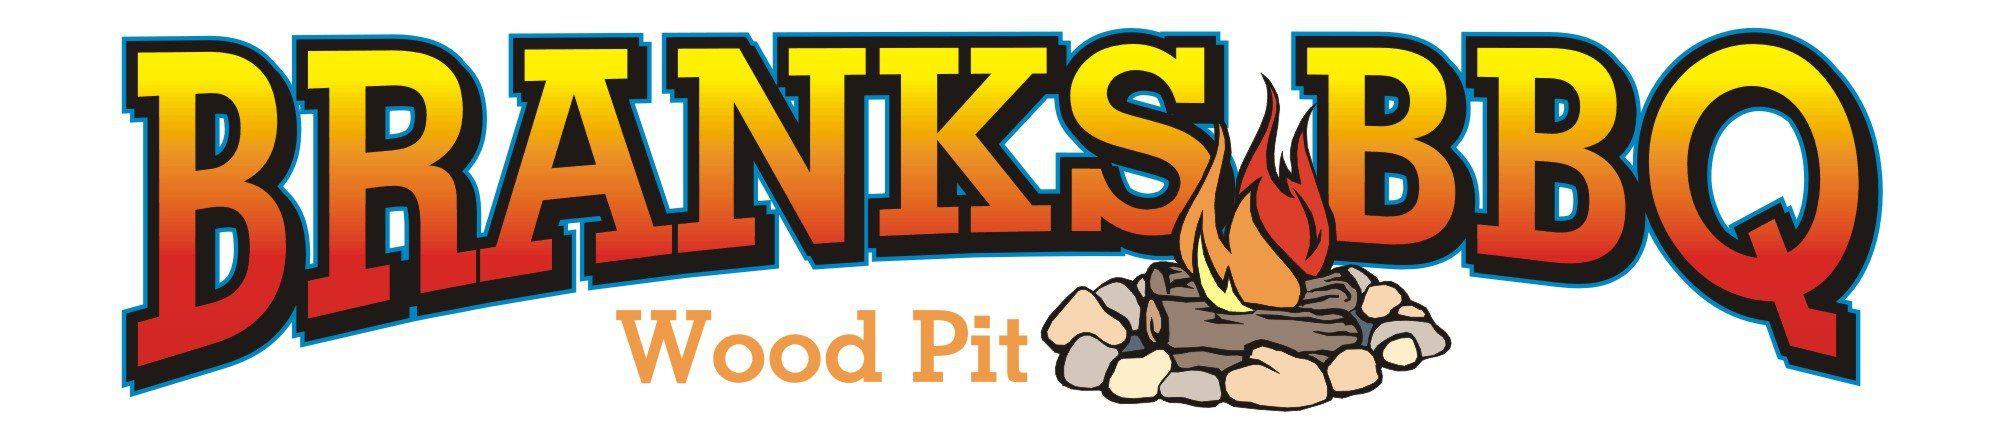 Branks BBQ Logo